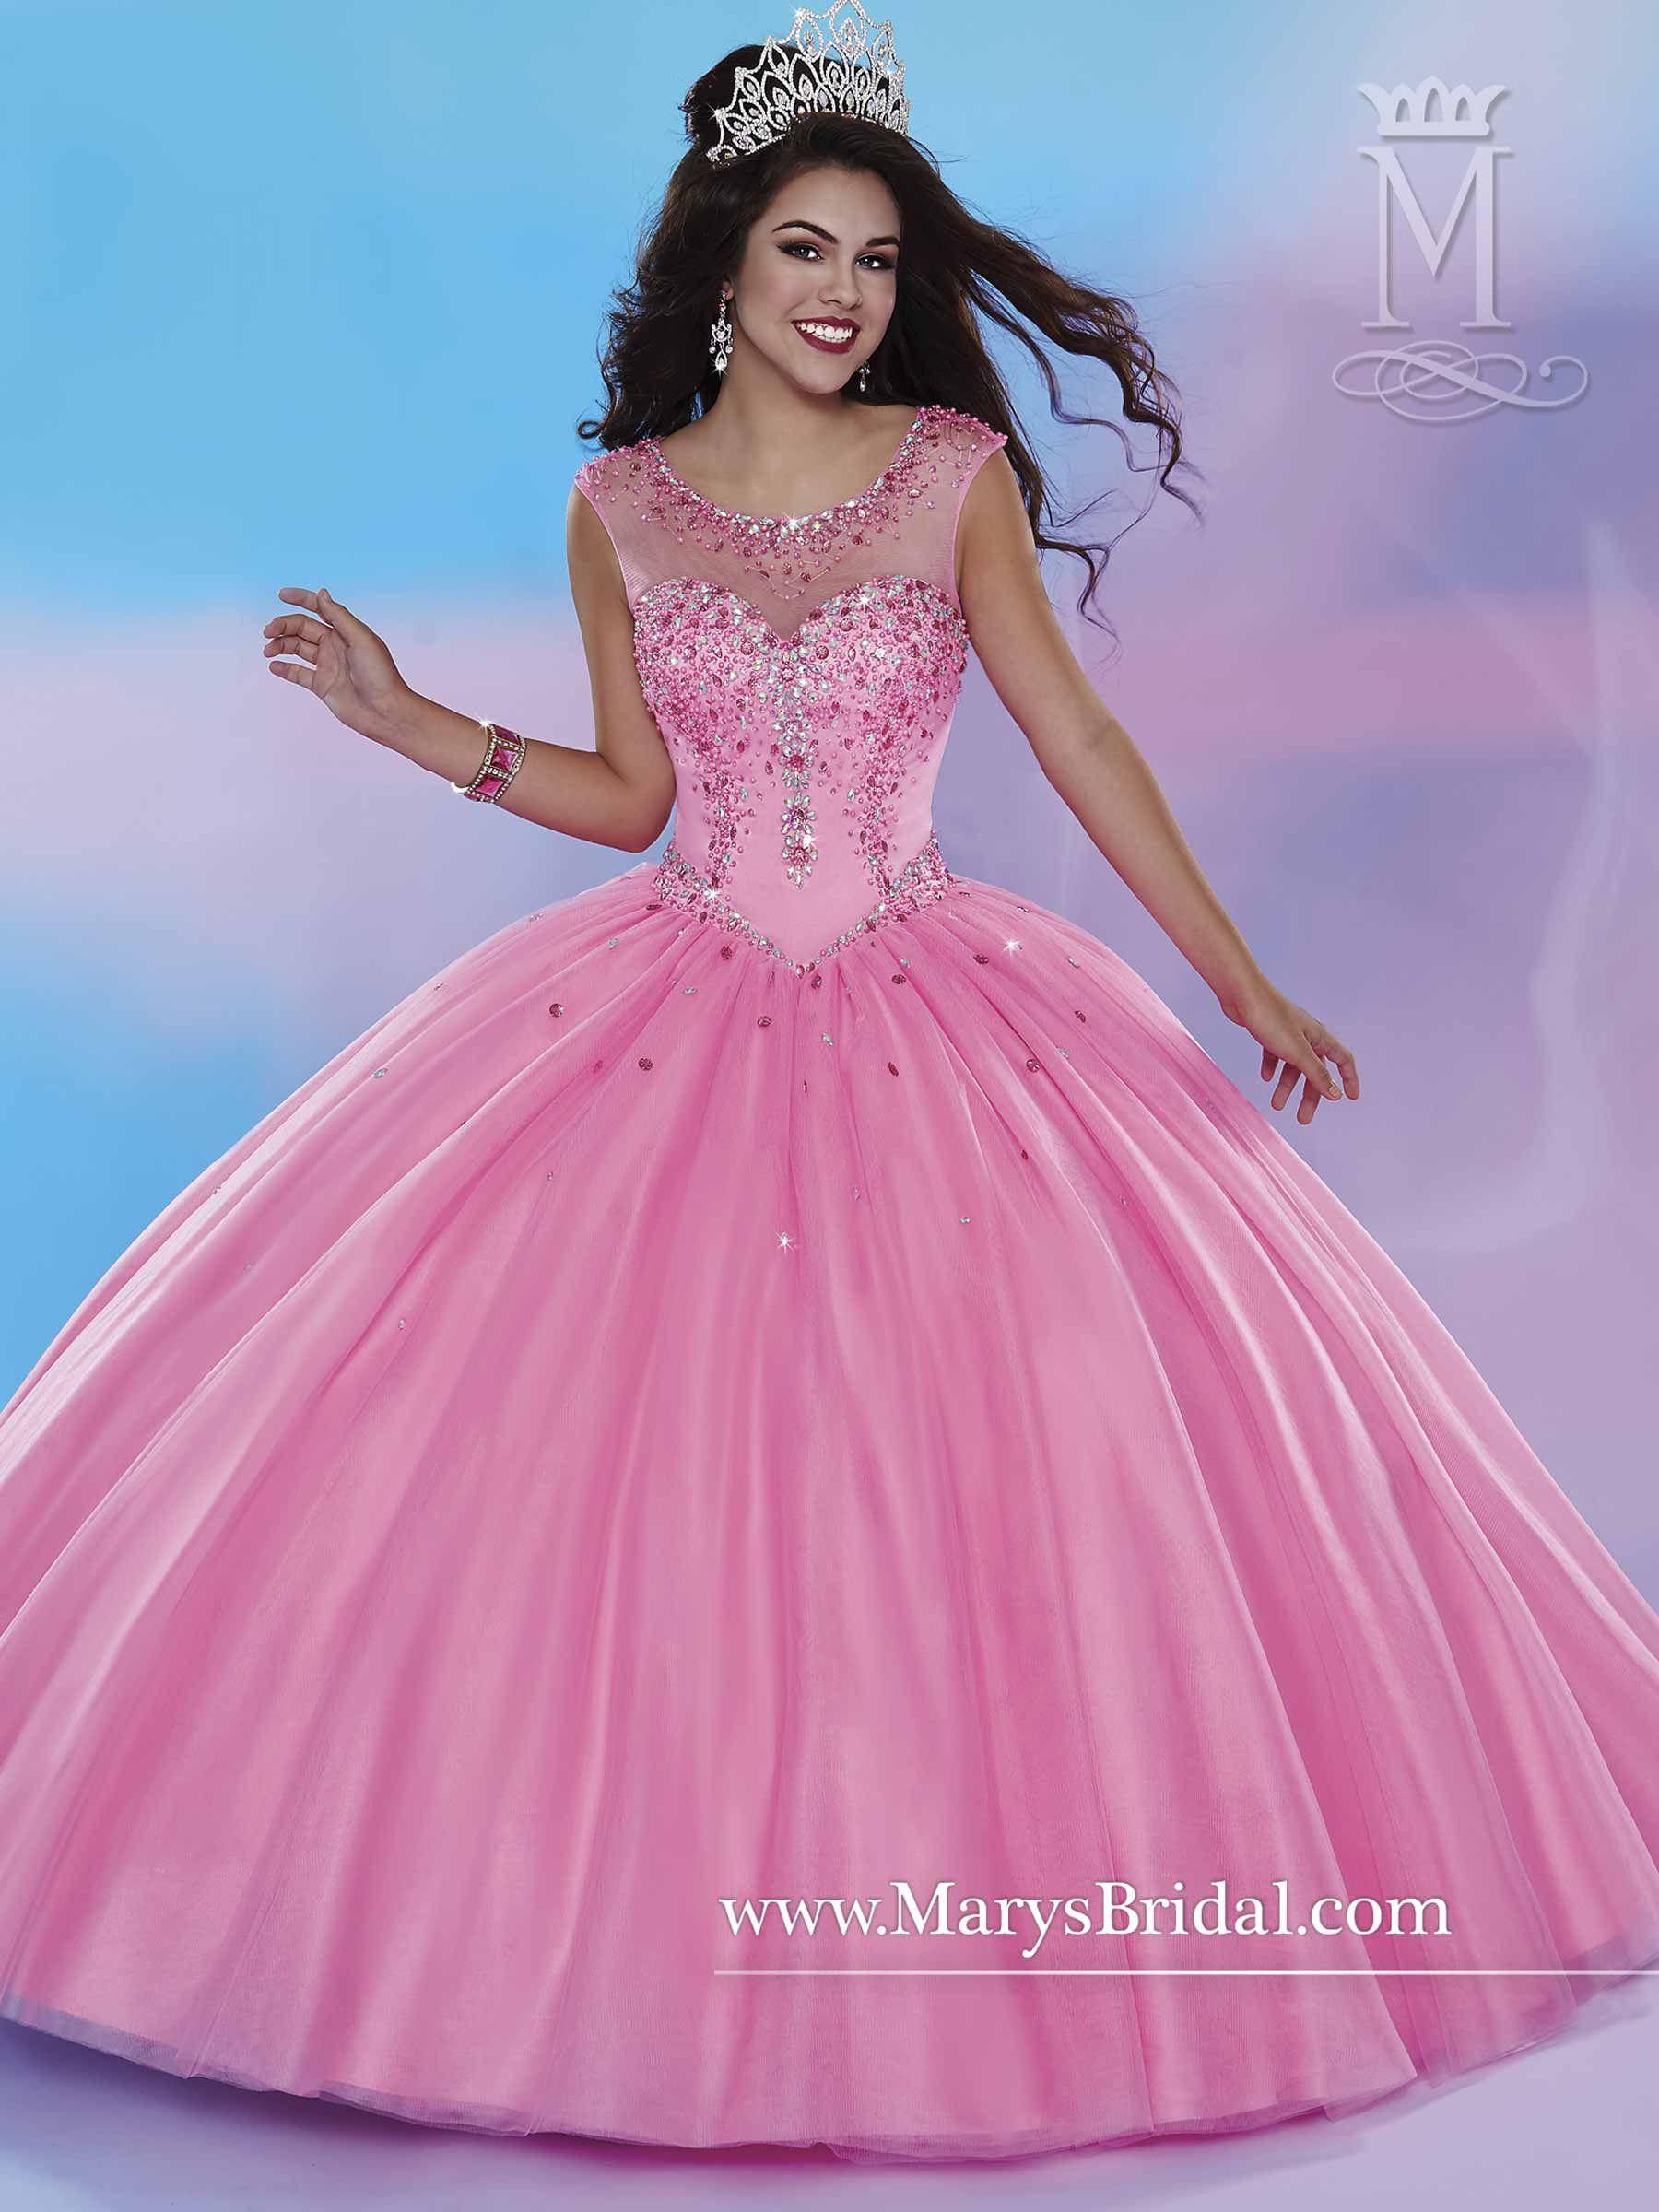 Pin de reyna ayala en quince dresses | Pinterest | Quinceañera ...